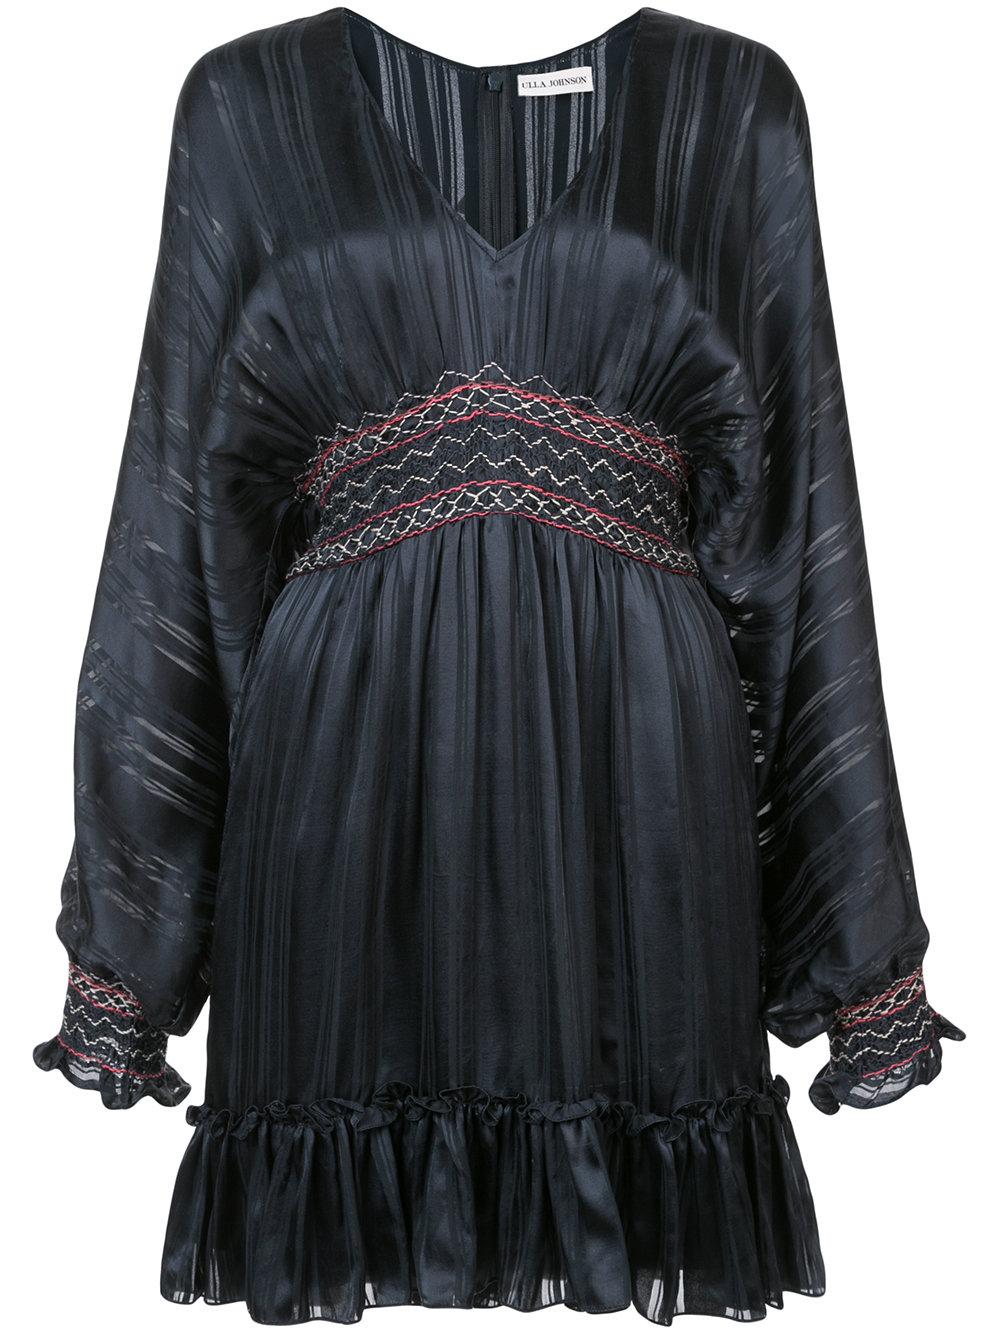 ULLA JOHNSON dress - $575